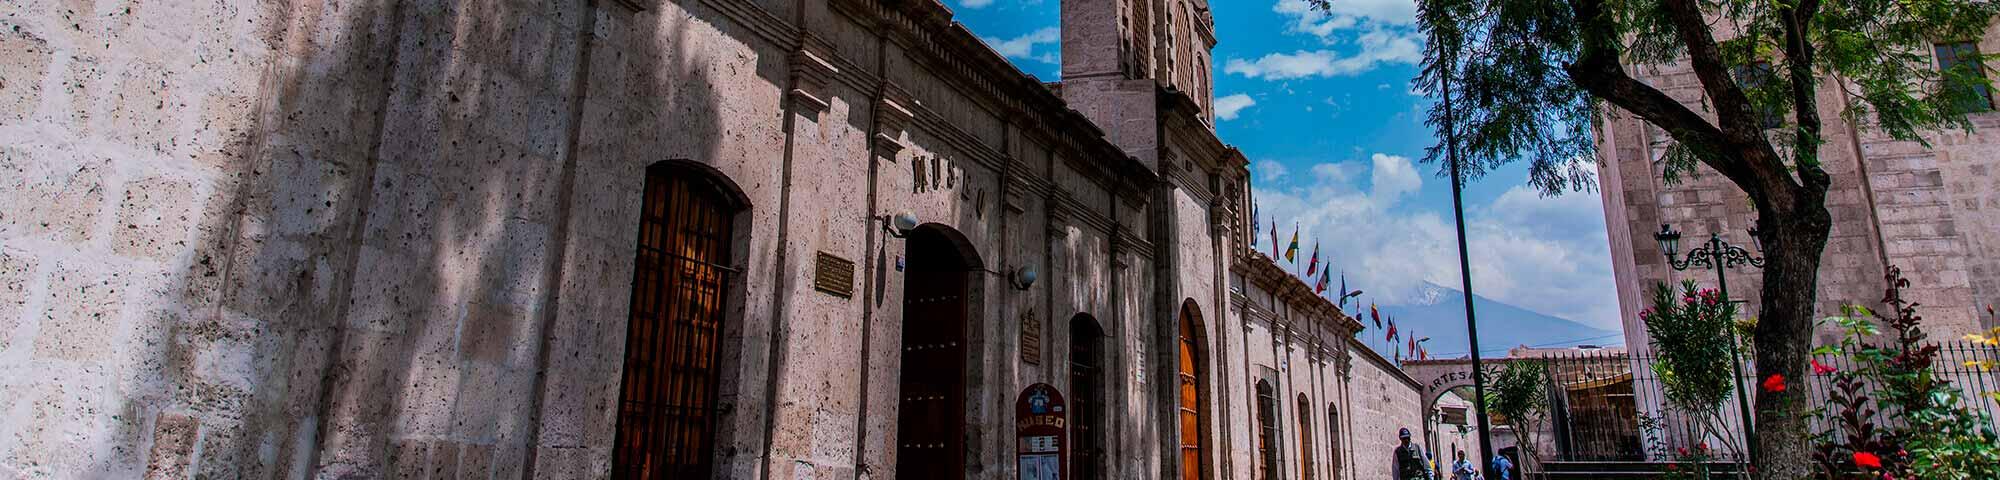 Museo Histórico Municipal Guillermo Zegarra Meneses